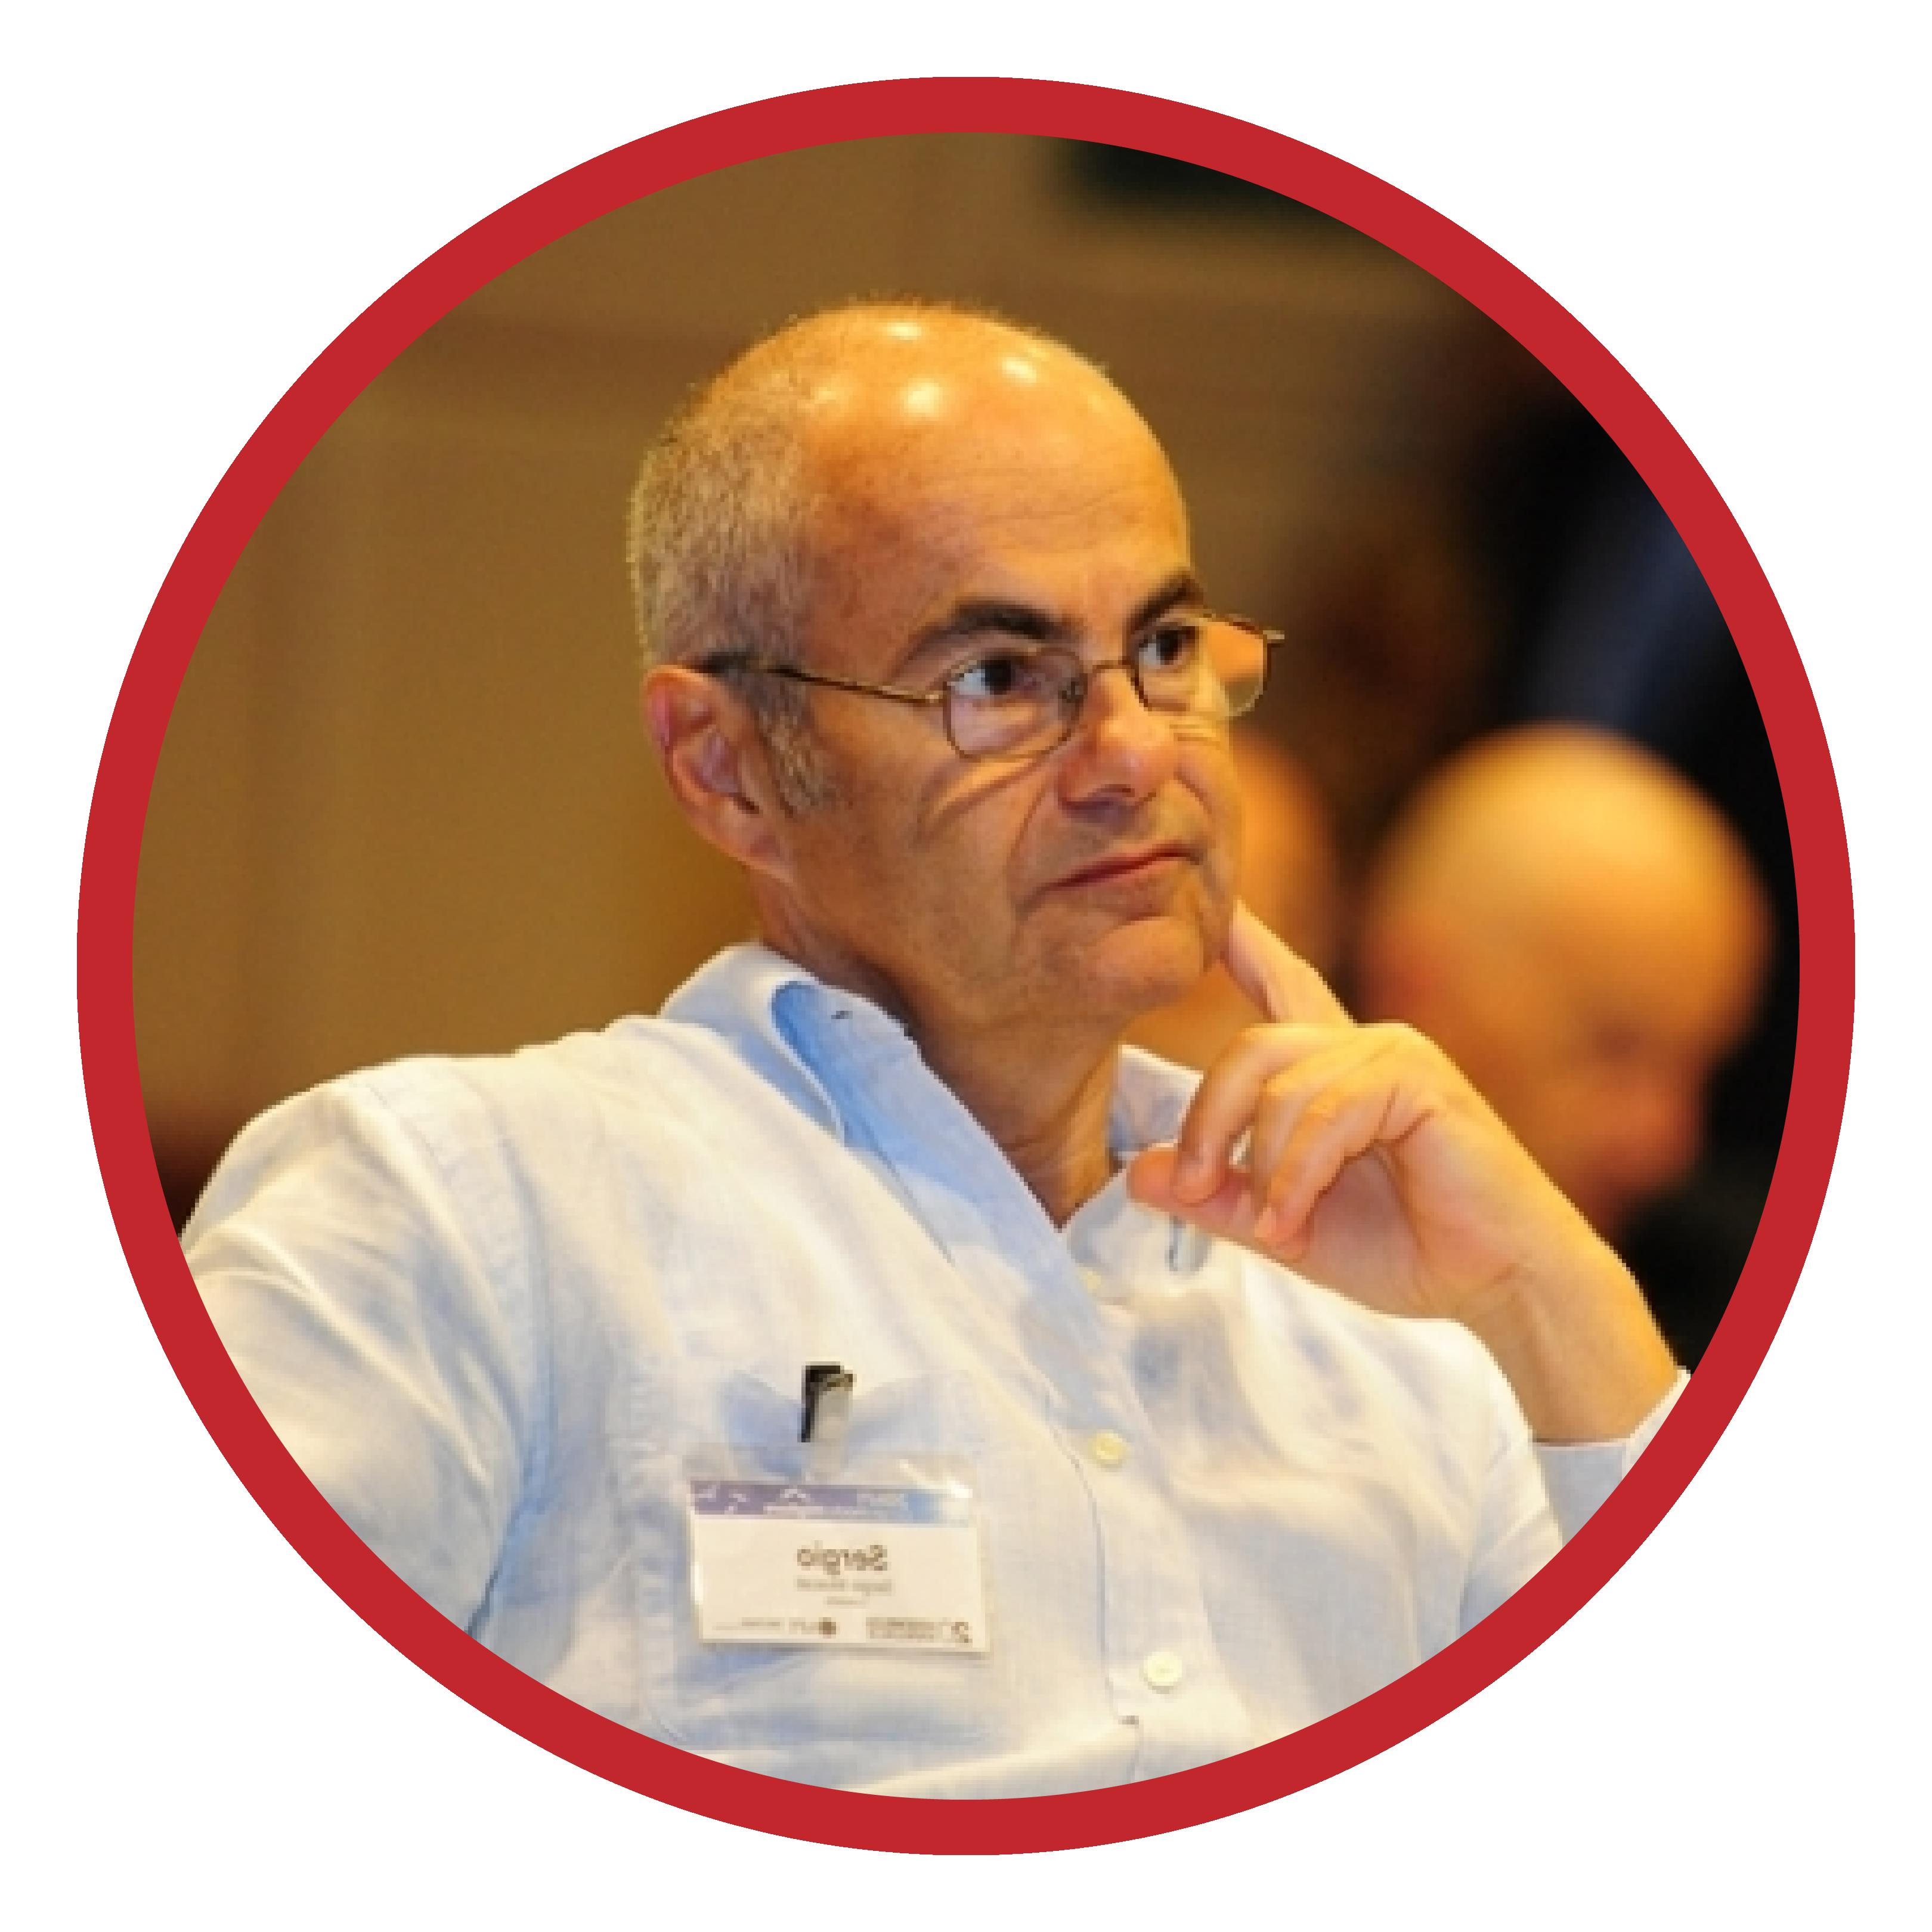 Sergio Moscati